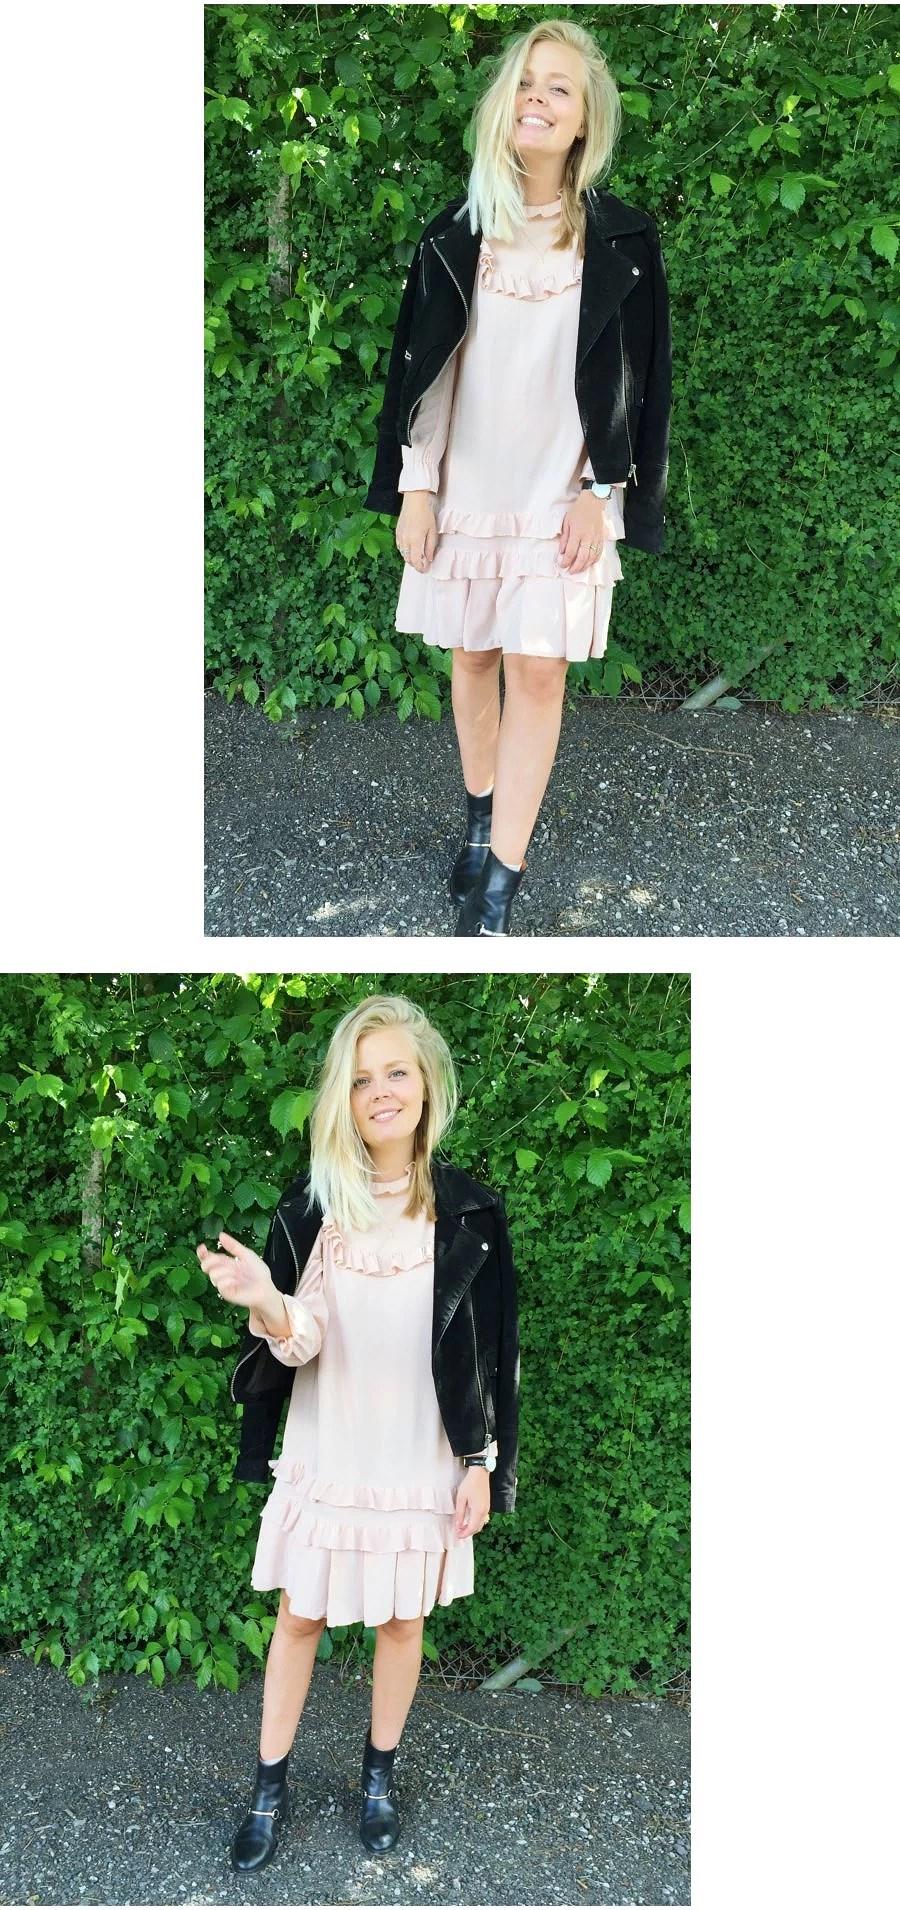 Wearing Amanda Bugge Dress